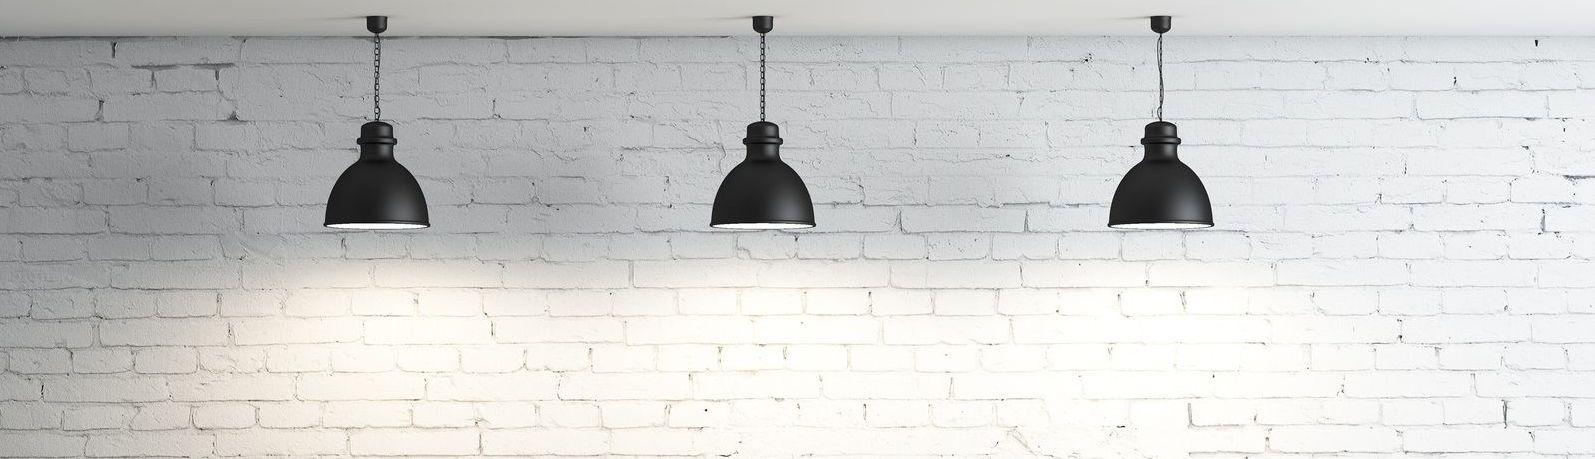 Syndicus en Vastgoedbeheer Norm Waregem: lamp-klantenzone-slider